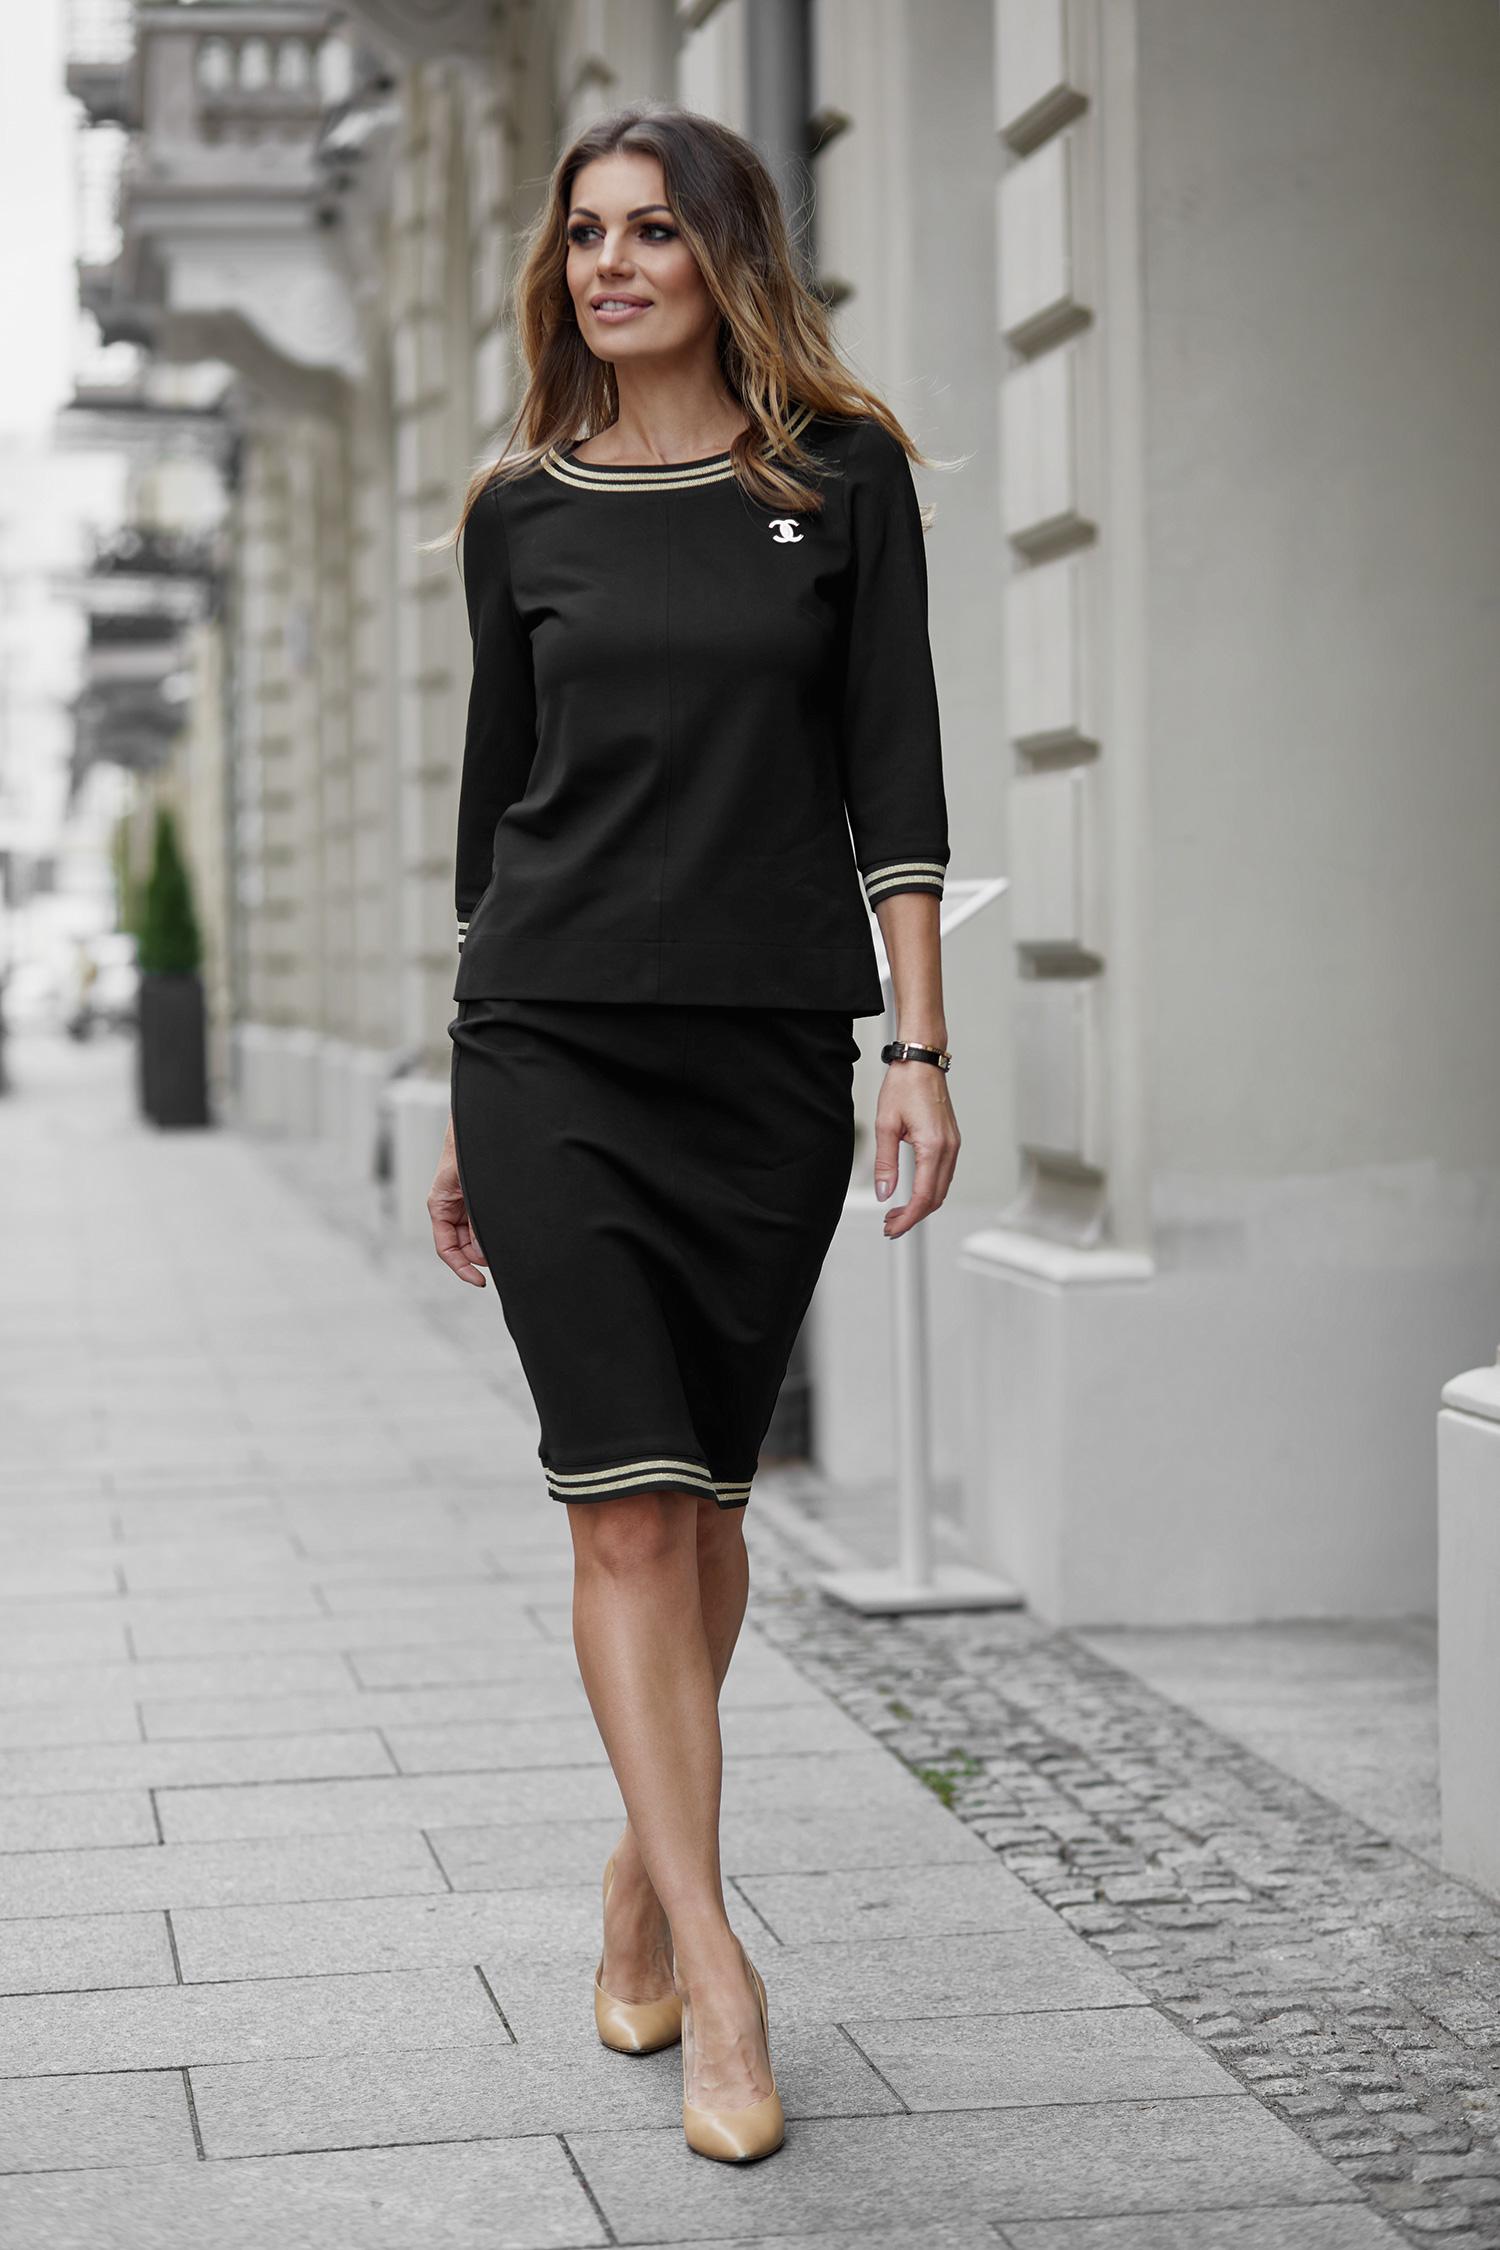 beca29c05cd55e Elegancki komplet bluzka + spódnica z broszką A258 - 7639555747 ...